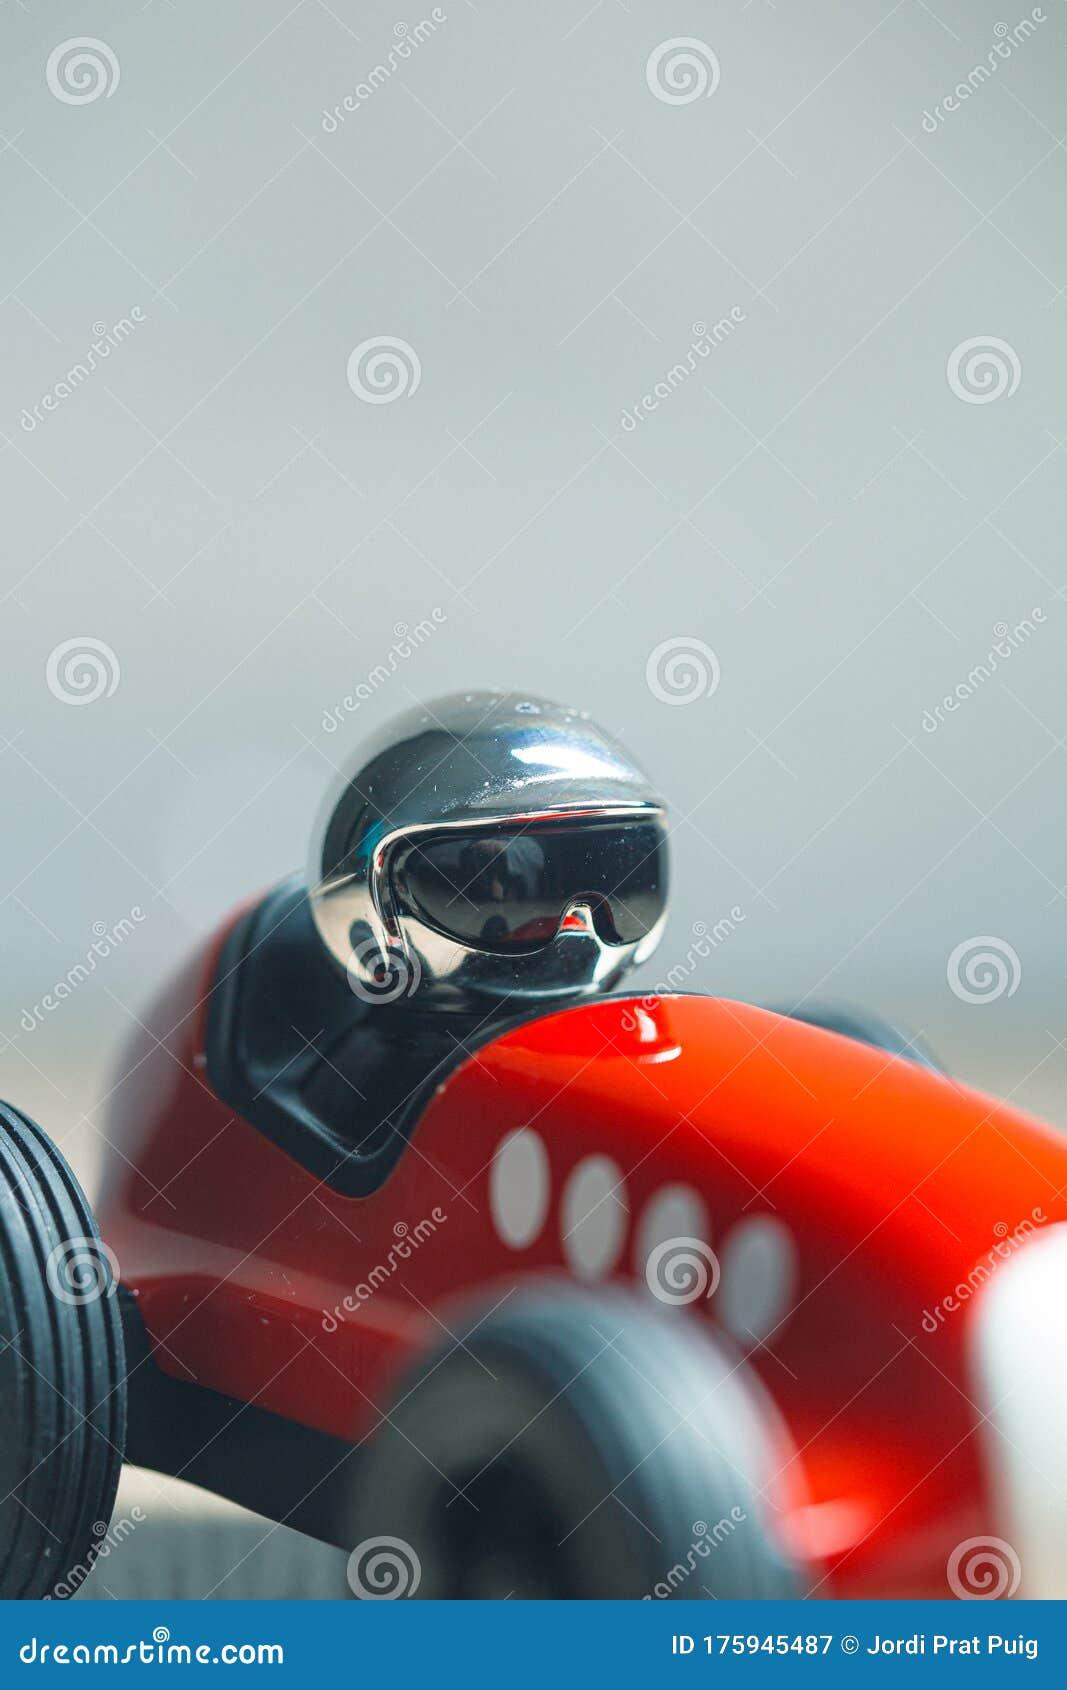 1 575 Helmet Racing Vintage Photos Free Royalty Free Stock Photos From Dreamstime